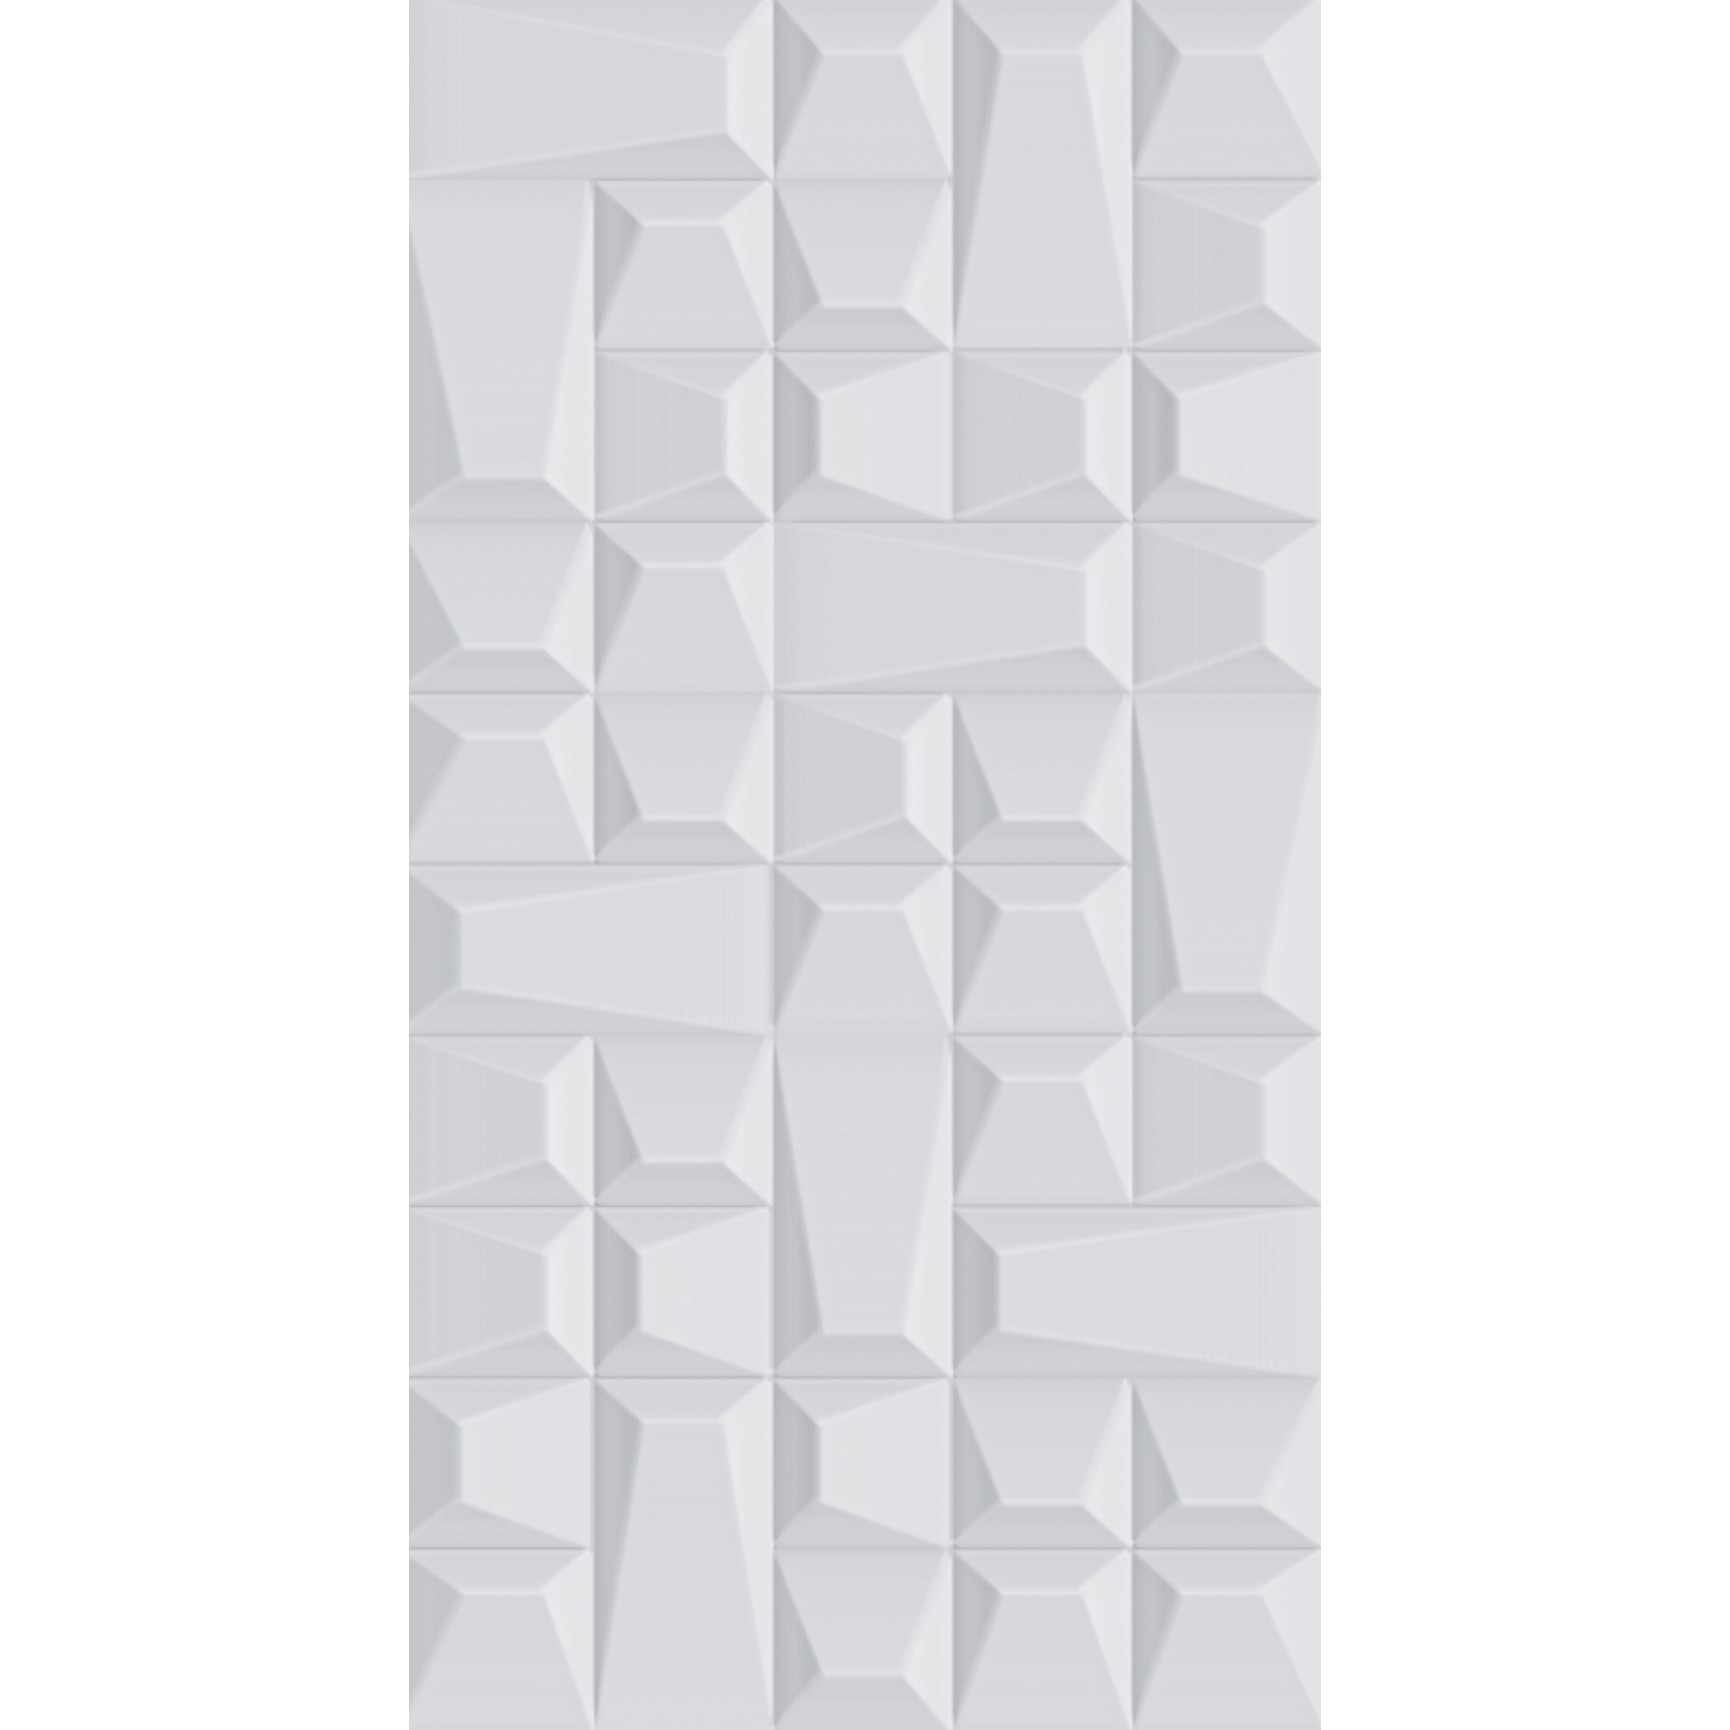 Revestimento Tipo A Geometric Bianco 32x60 cm - Biancogres